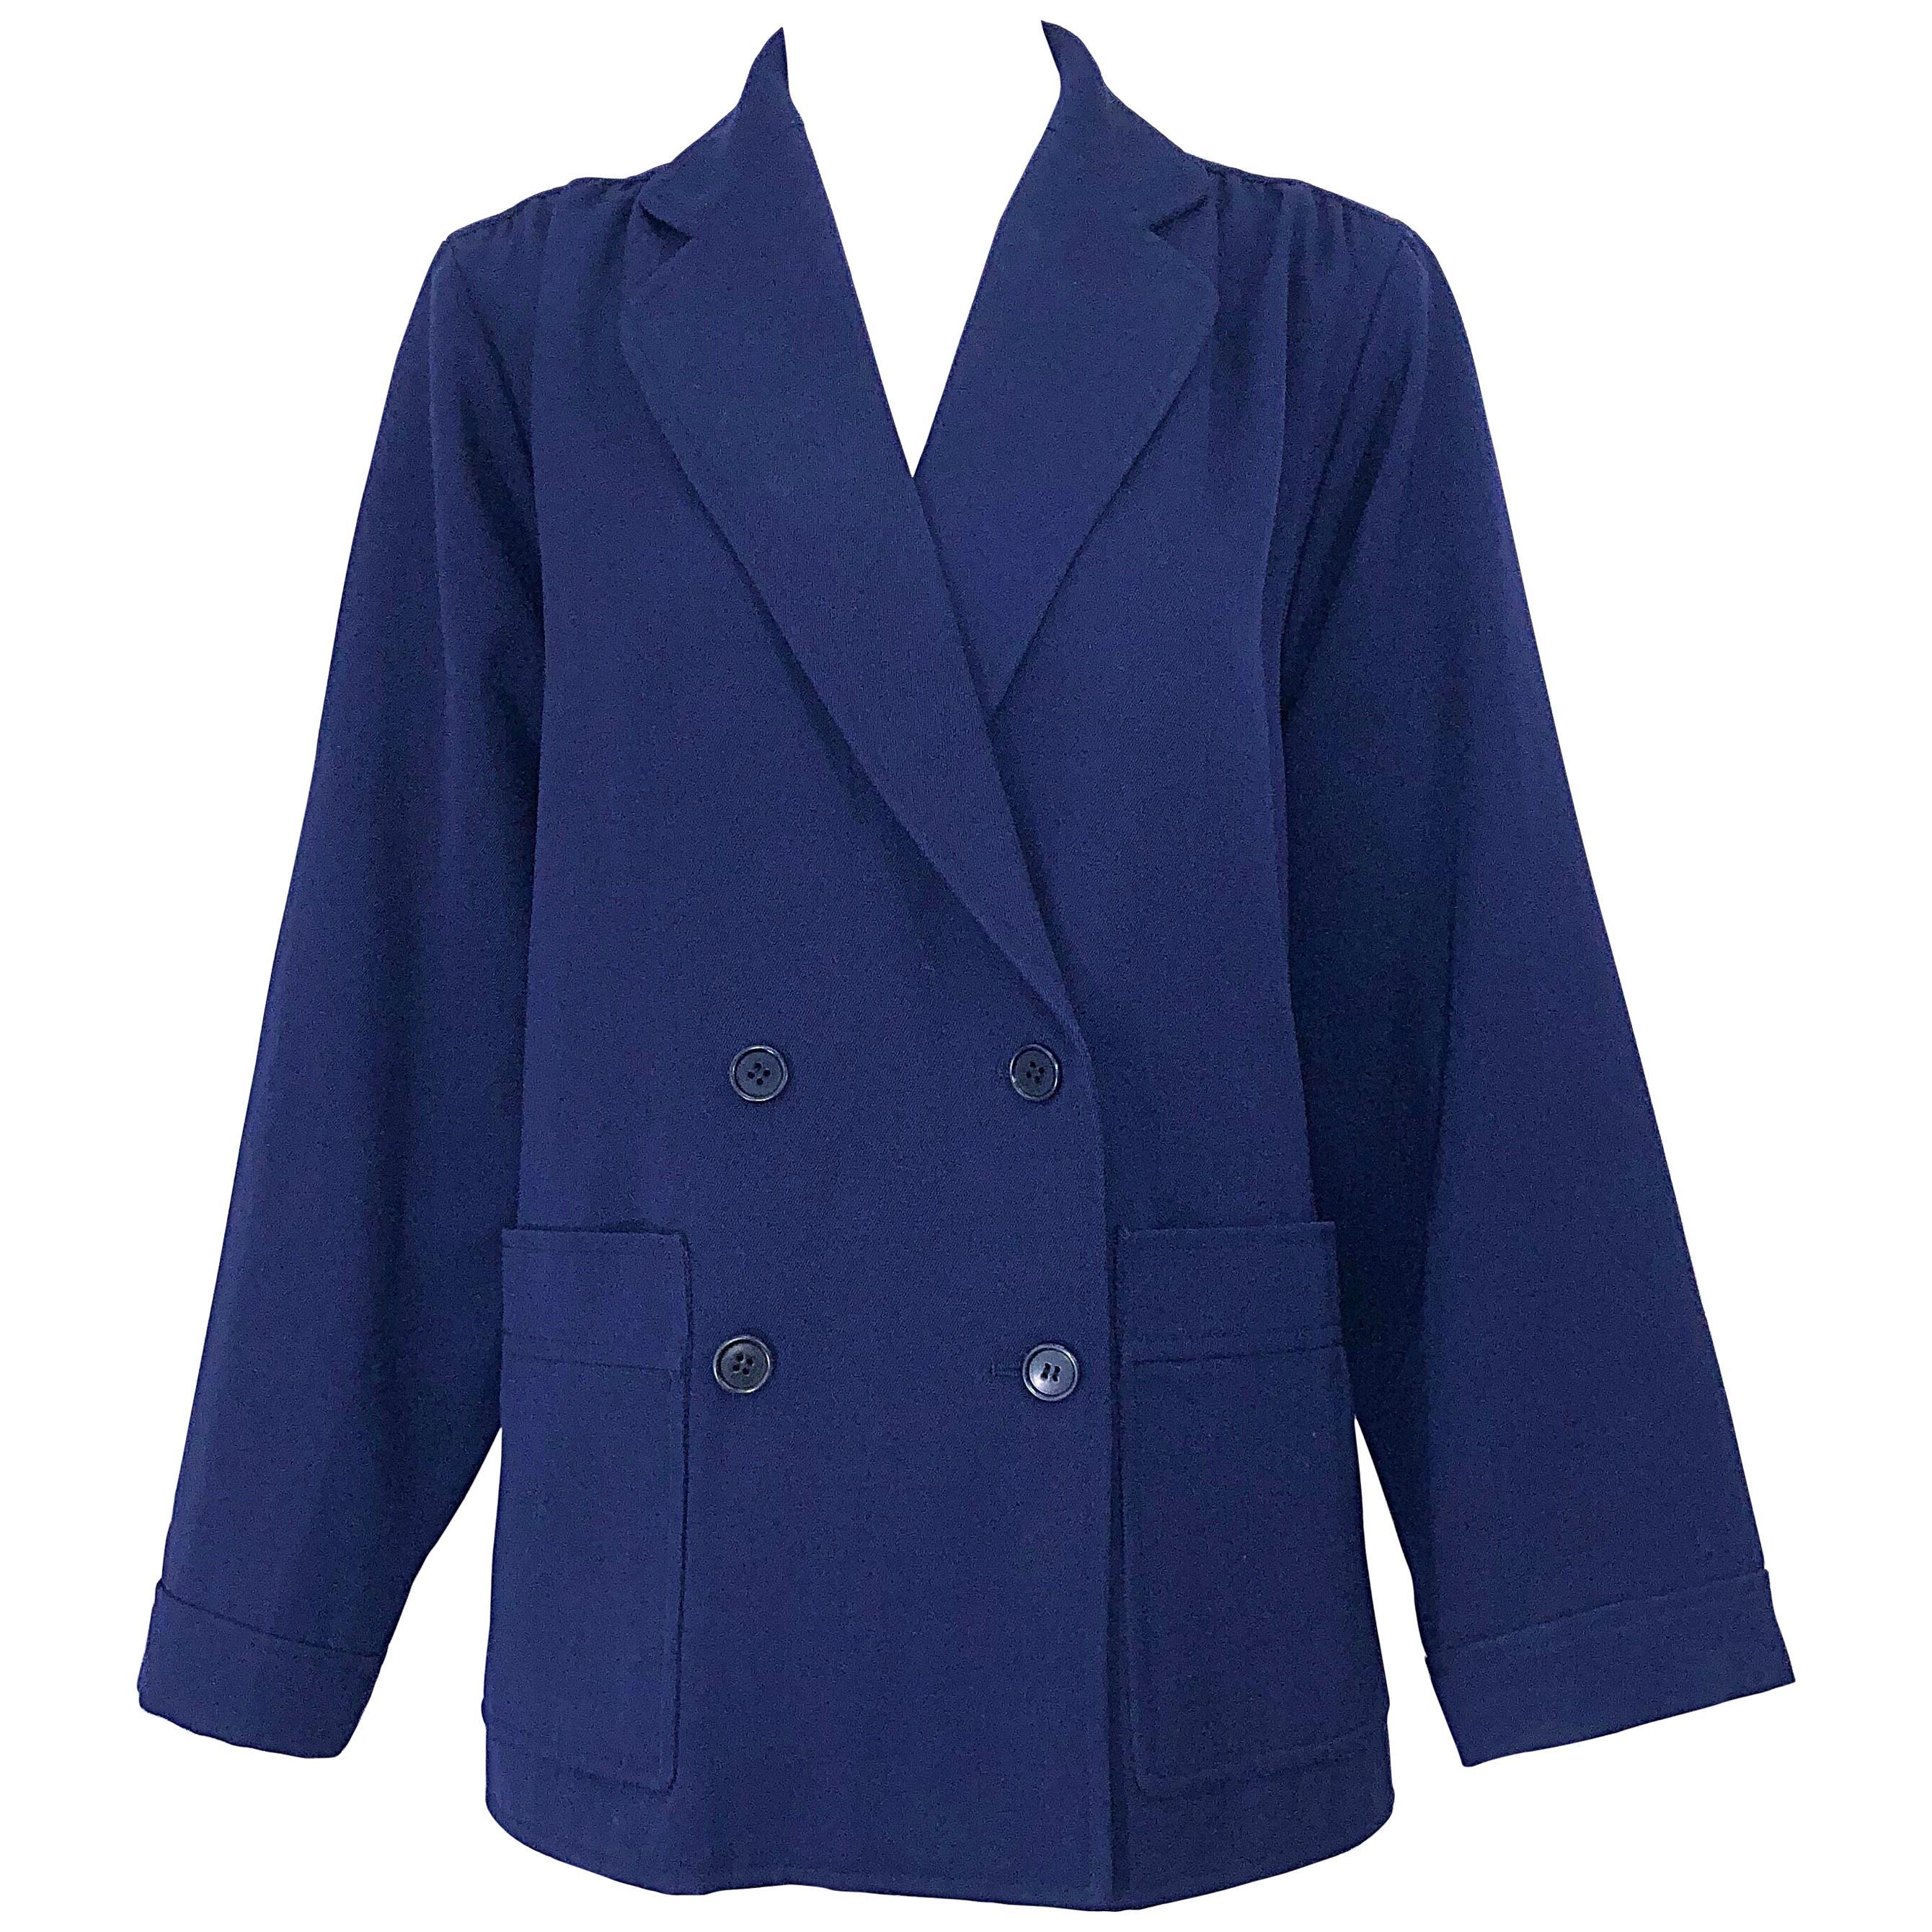 Chic 1960s Yves Saint Laurent Navy Blue Lightweight Wool Vintage Swing Jacket